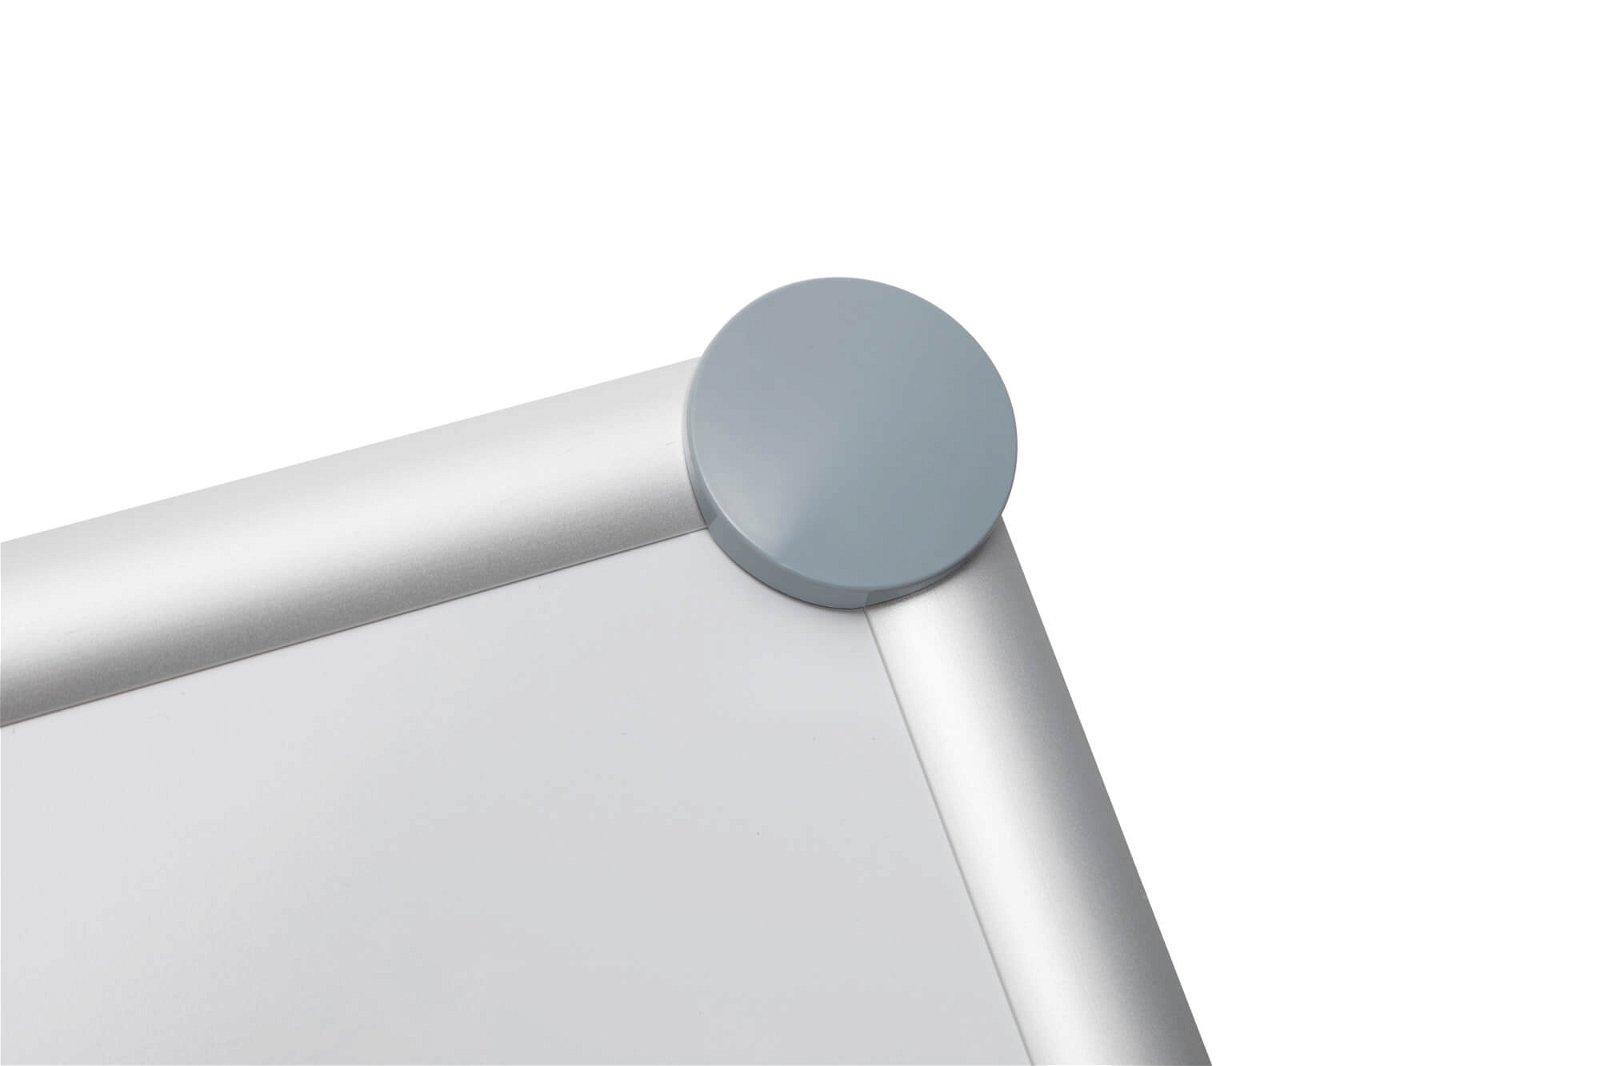 Whiteboard 2000 MAULpro, 100x150 cm, grau